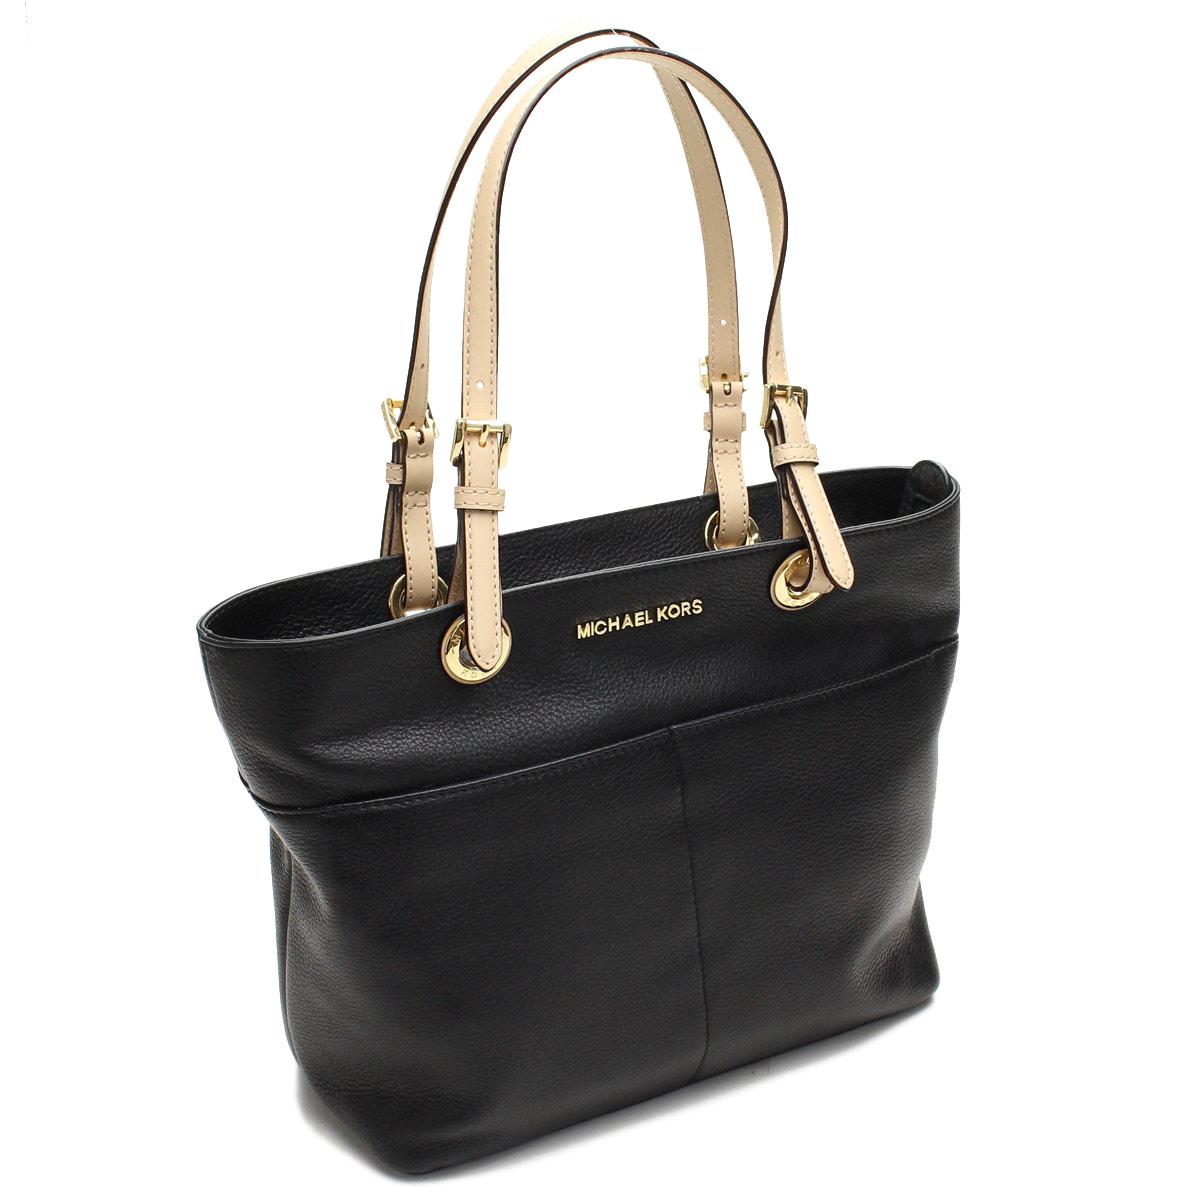 Michael Kors Bedford Tote Bag 30h4gbft6l Black Taxfree Send By Ems Authentic A Brand New Item Rakuten Global Market